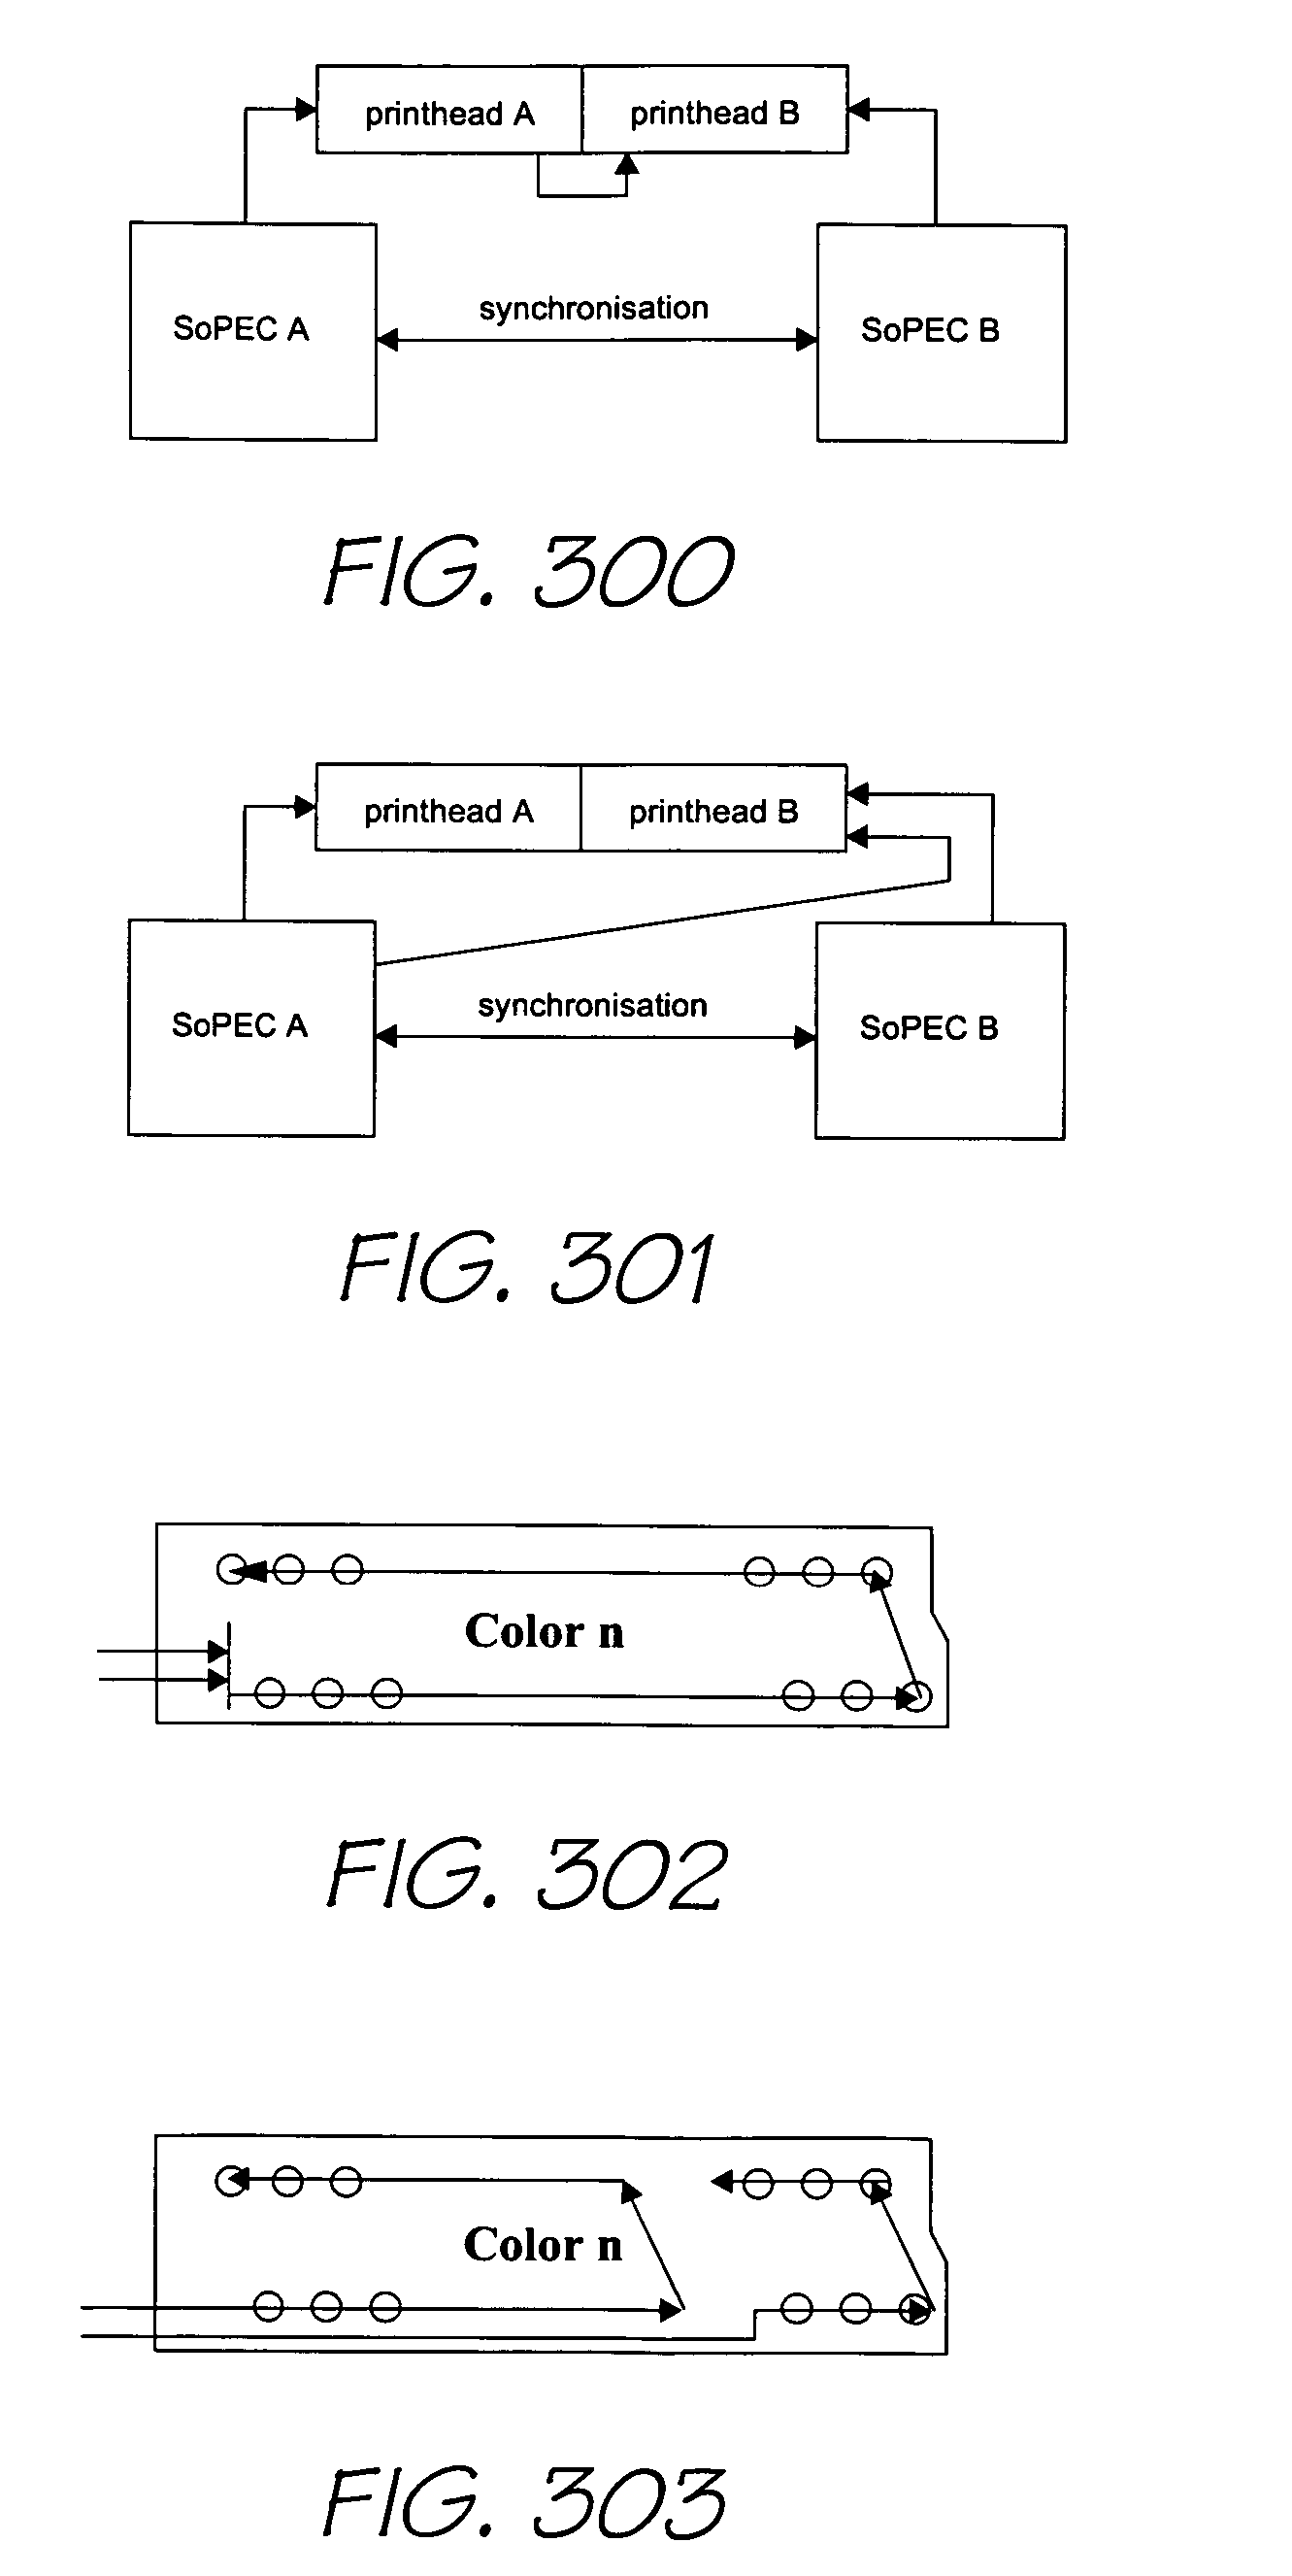 US7163345B2 - Printhead having printhead modules vertically